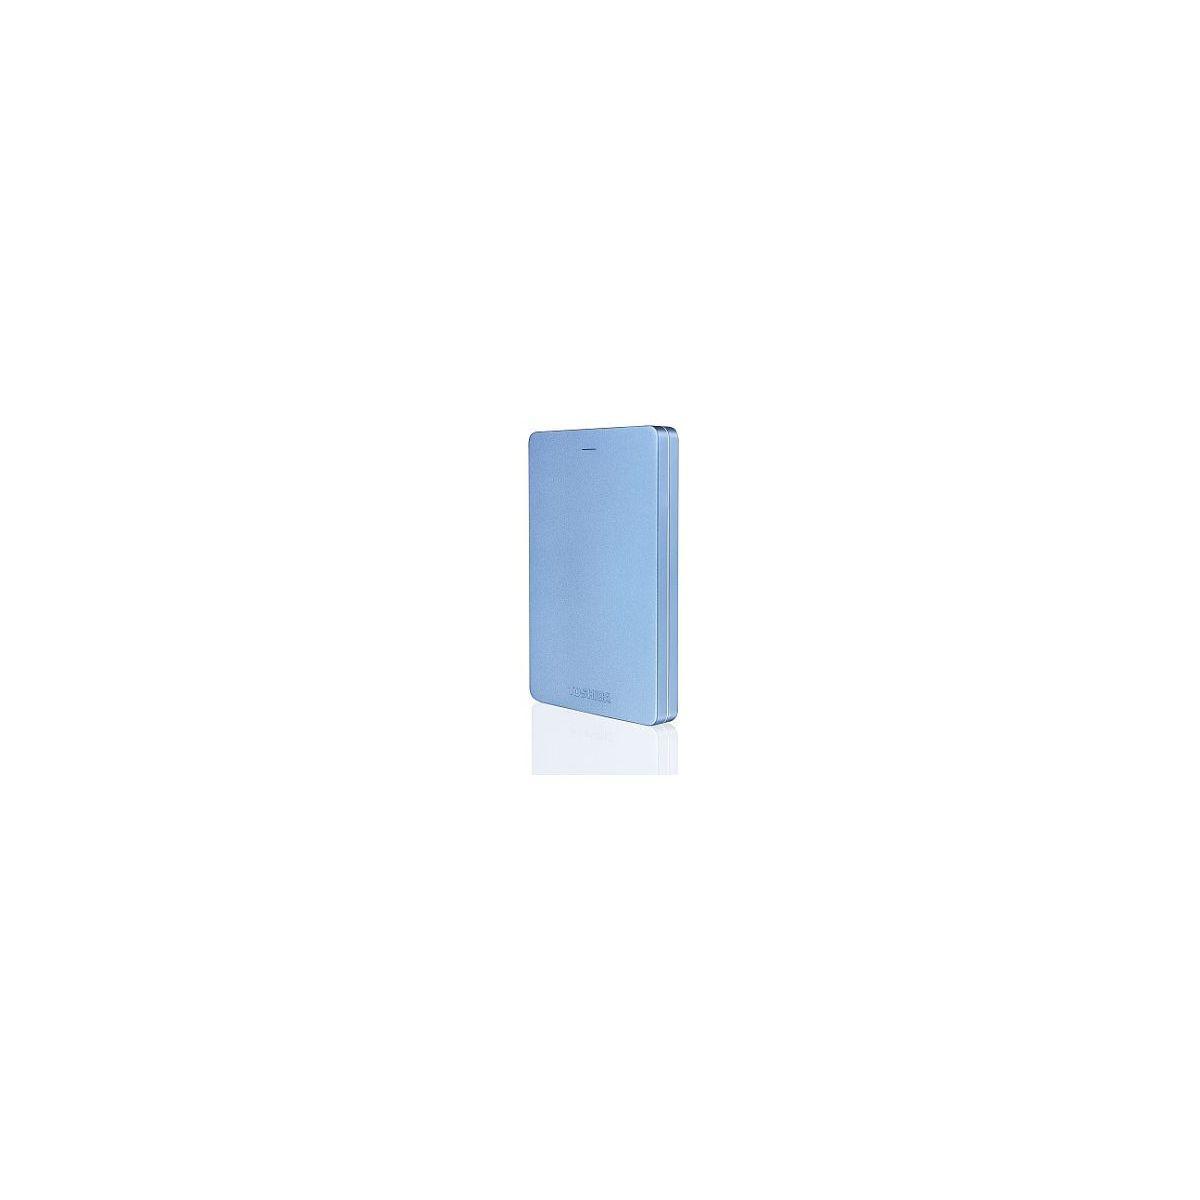 Disque dur externe de poche toshiba 2,5 500go canvio alu 3s - 3% de remise immédiate avec le code : multi3